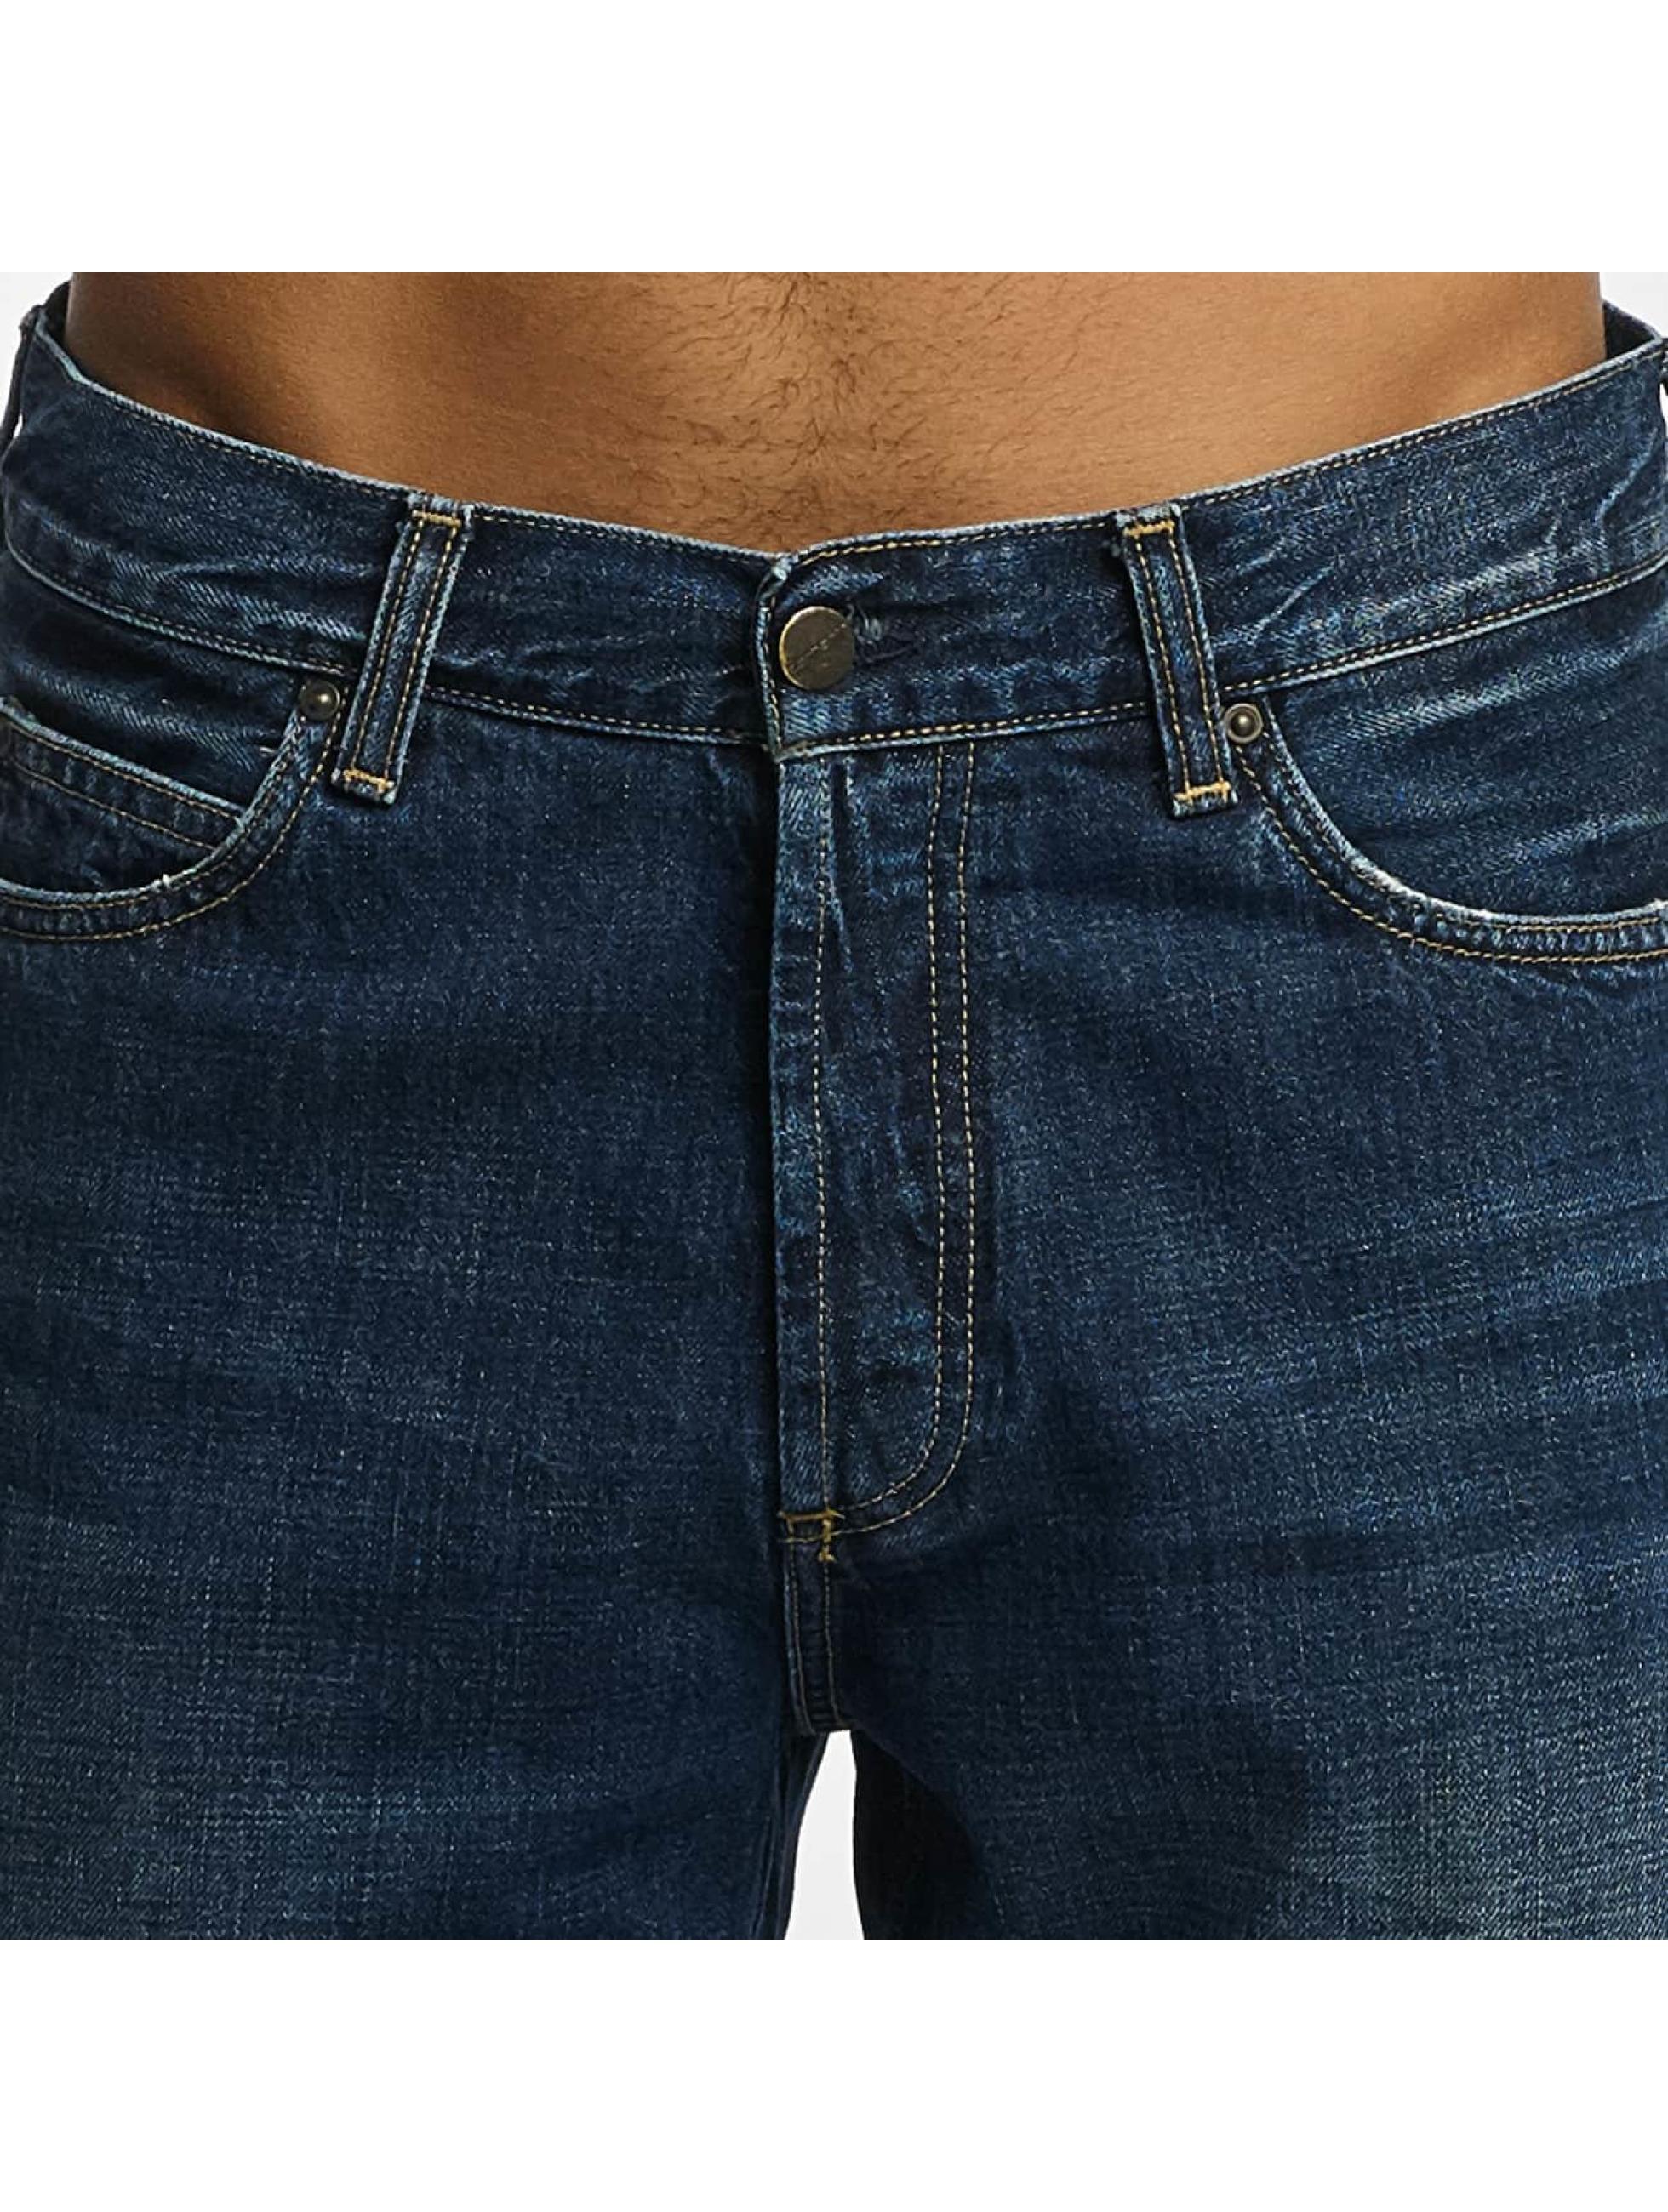 Carhartt WIP Straight Fit Jeans Edgewood Marlow blue